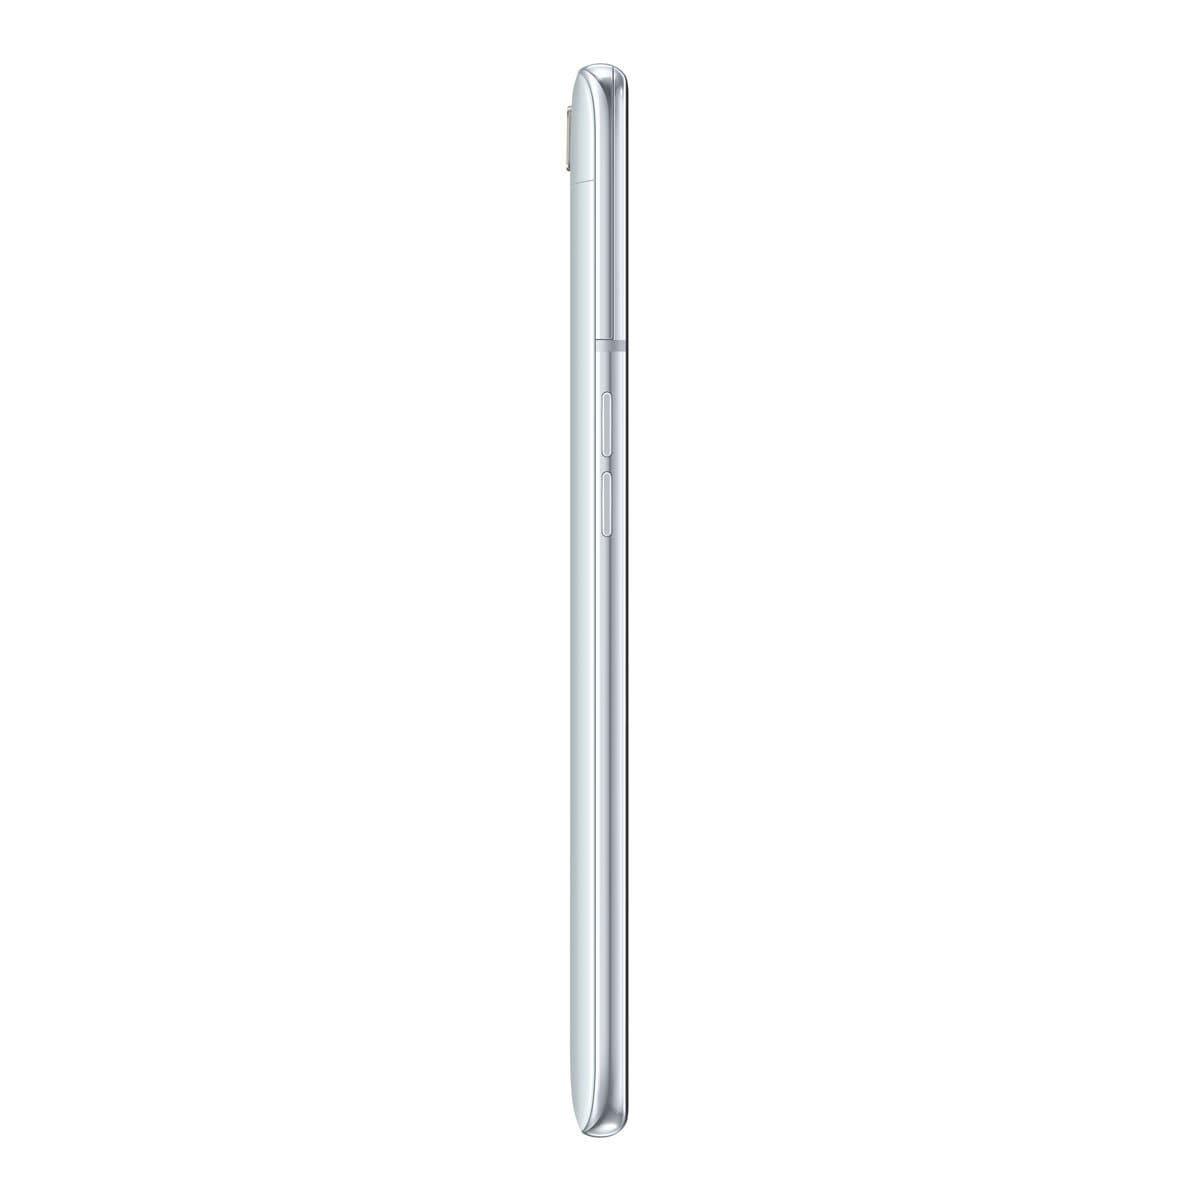 Celular Samsung Galaxy A80 Color Blanco R9 (Telcel)